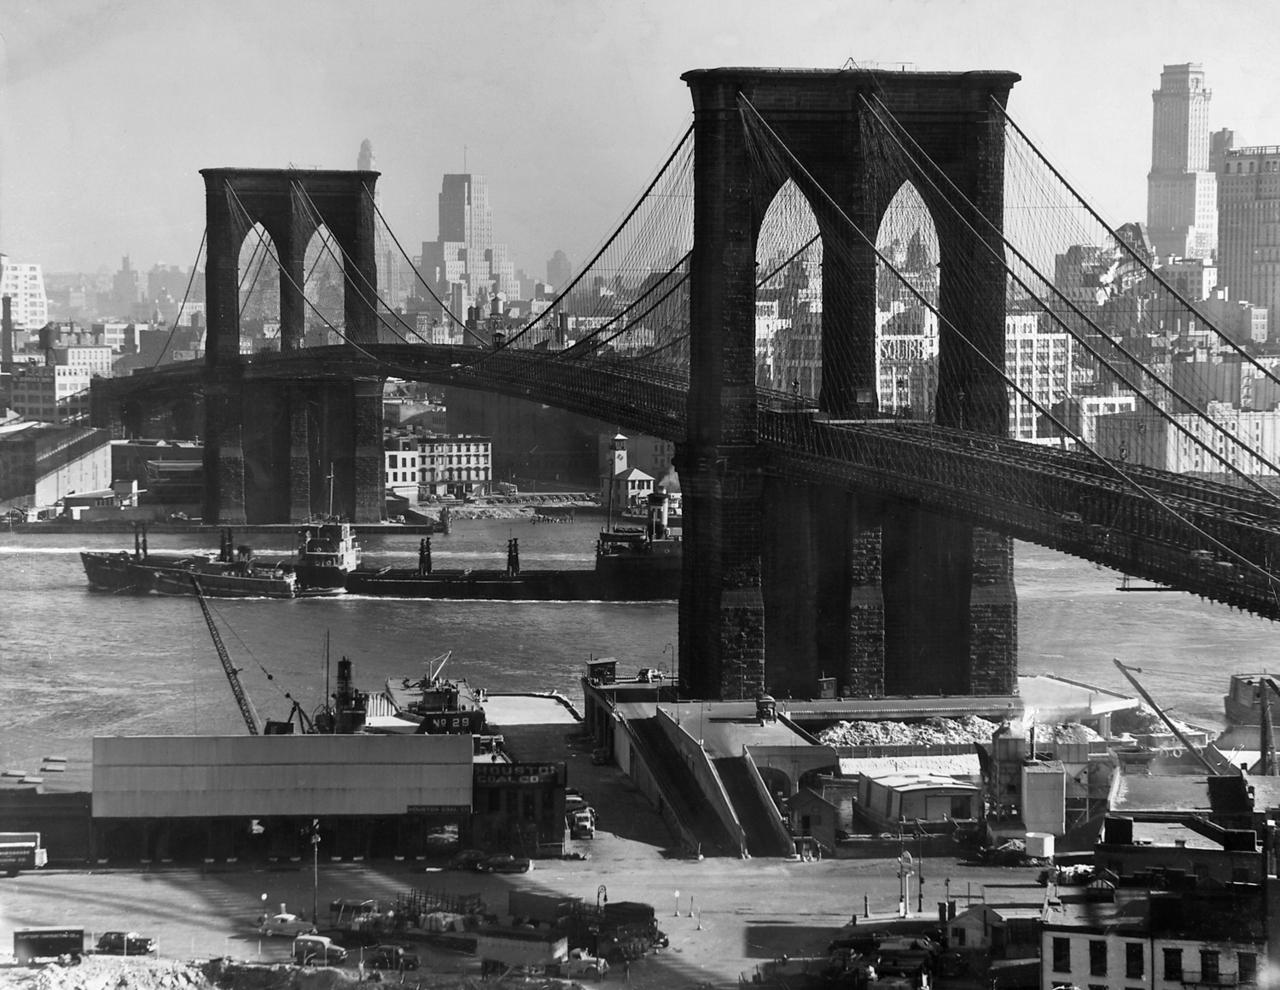 View of the Brooklyn Bridge looking toward Brooklyn, photo taken by Bauhaus master Andreas Feininger (1920s)